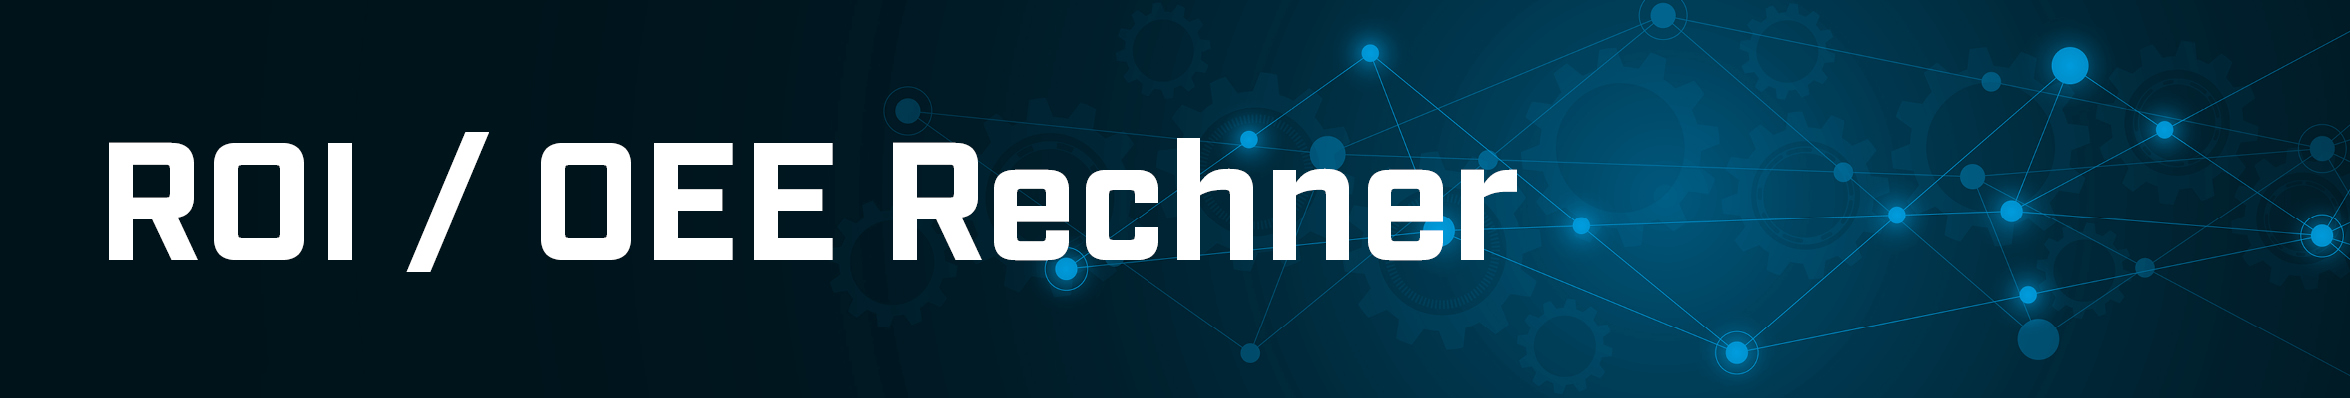 ROI / OEE Rechner